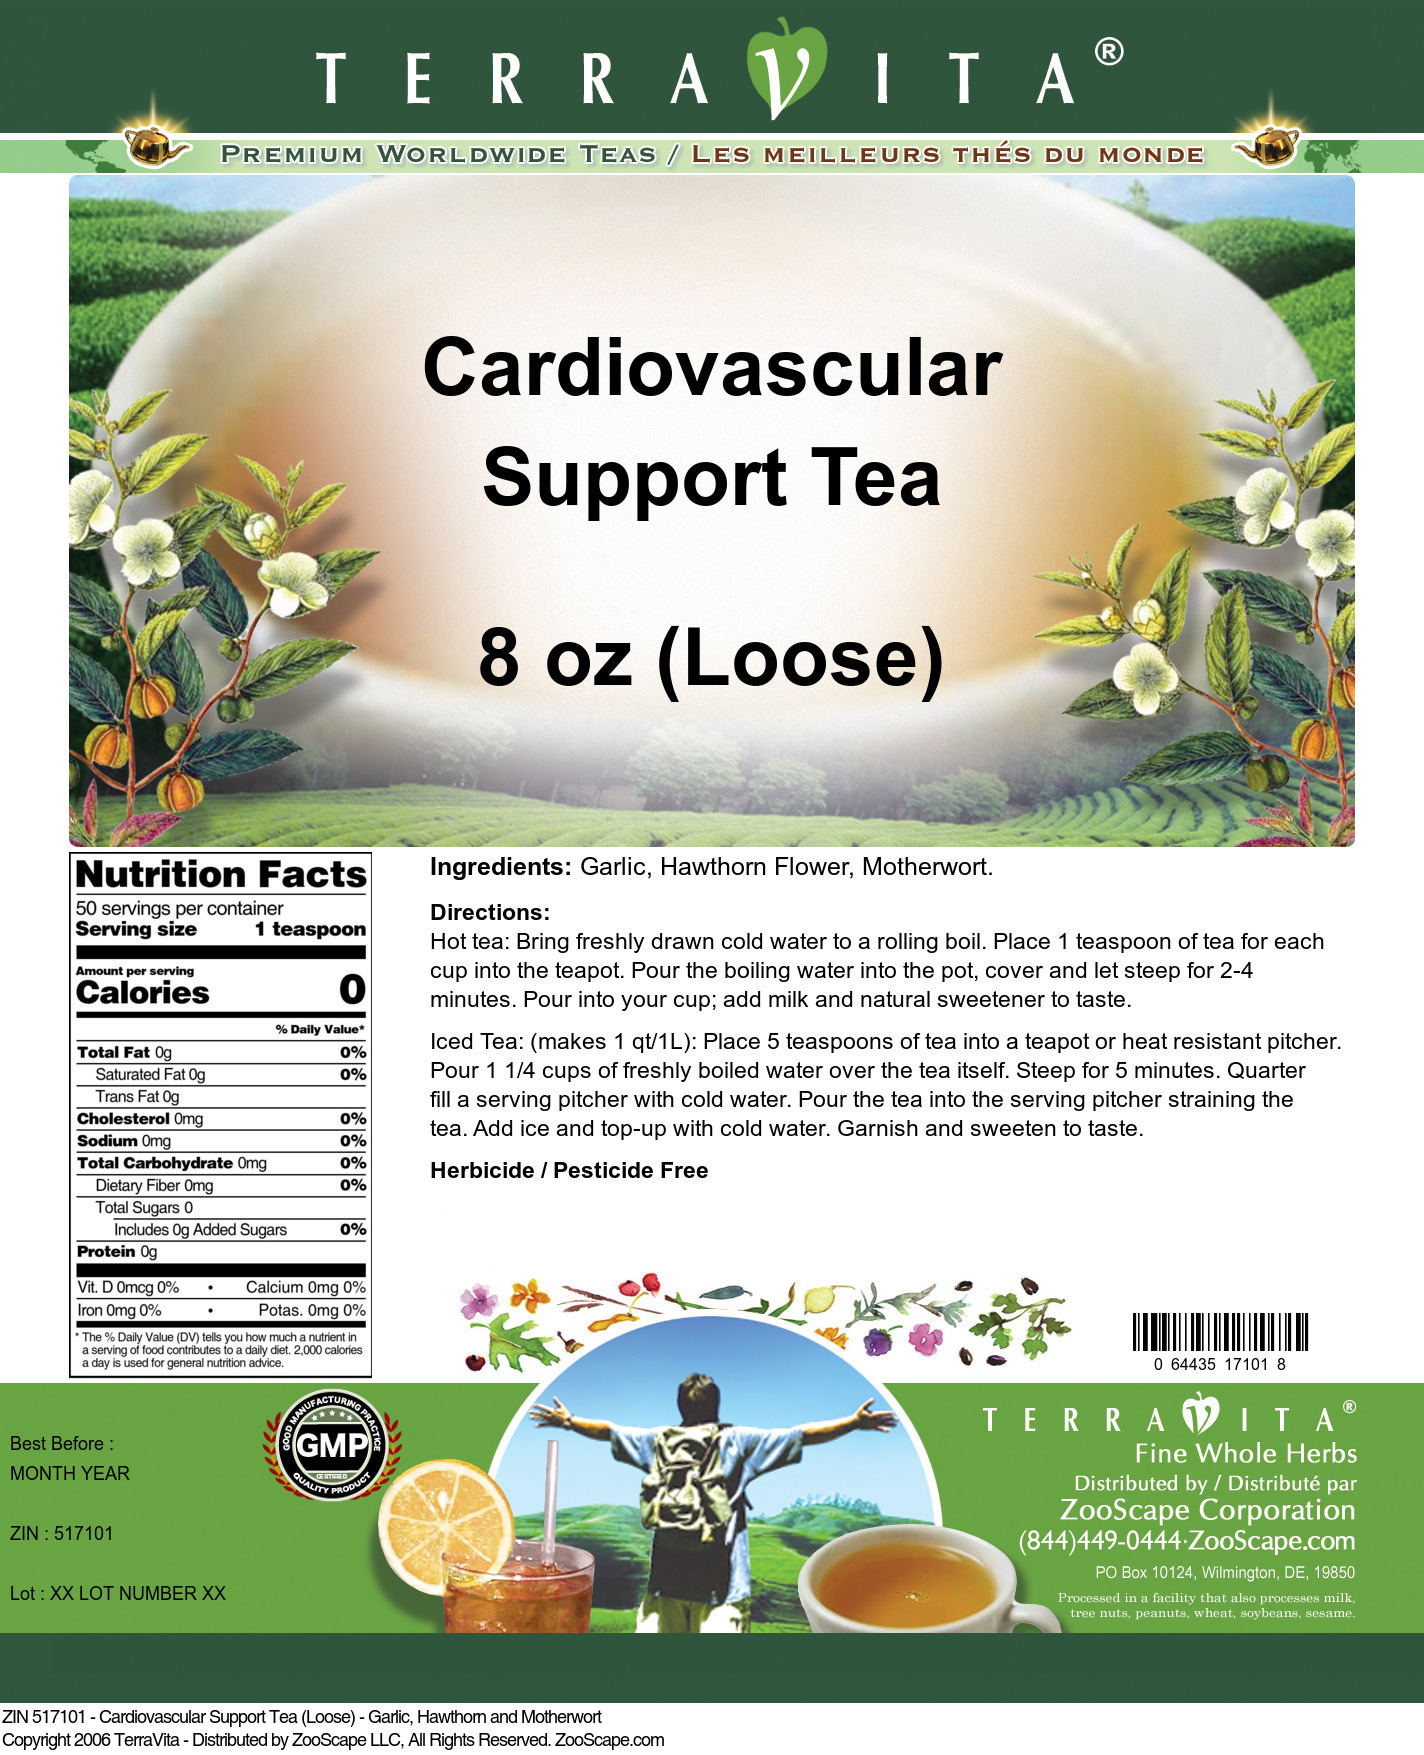 Cardiovascular Support Tea (Loose) - Garlic, Hawthorn and Motherwort